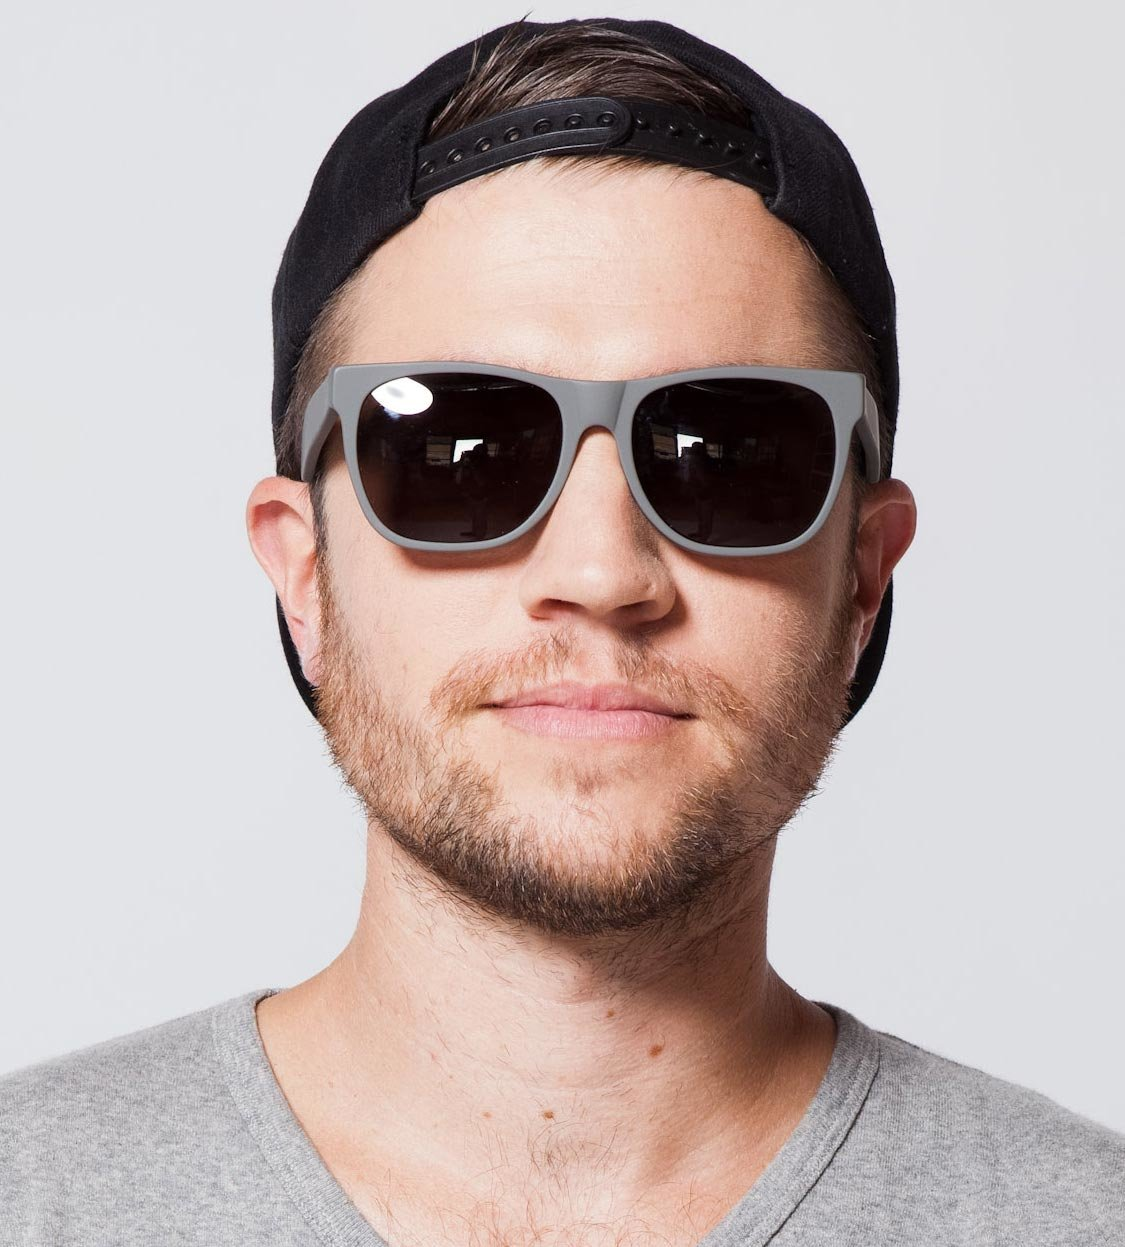 рекламы шарах картинки мужчины темных очках цветовая палитра, особенные